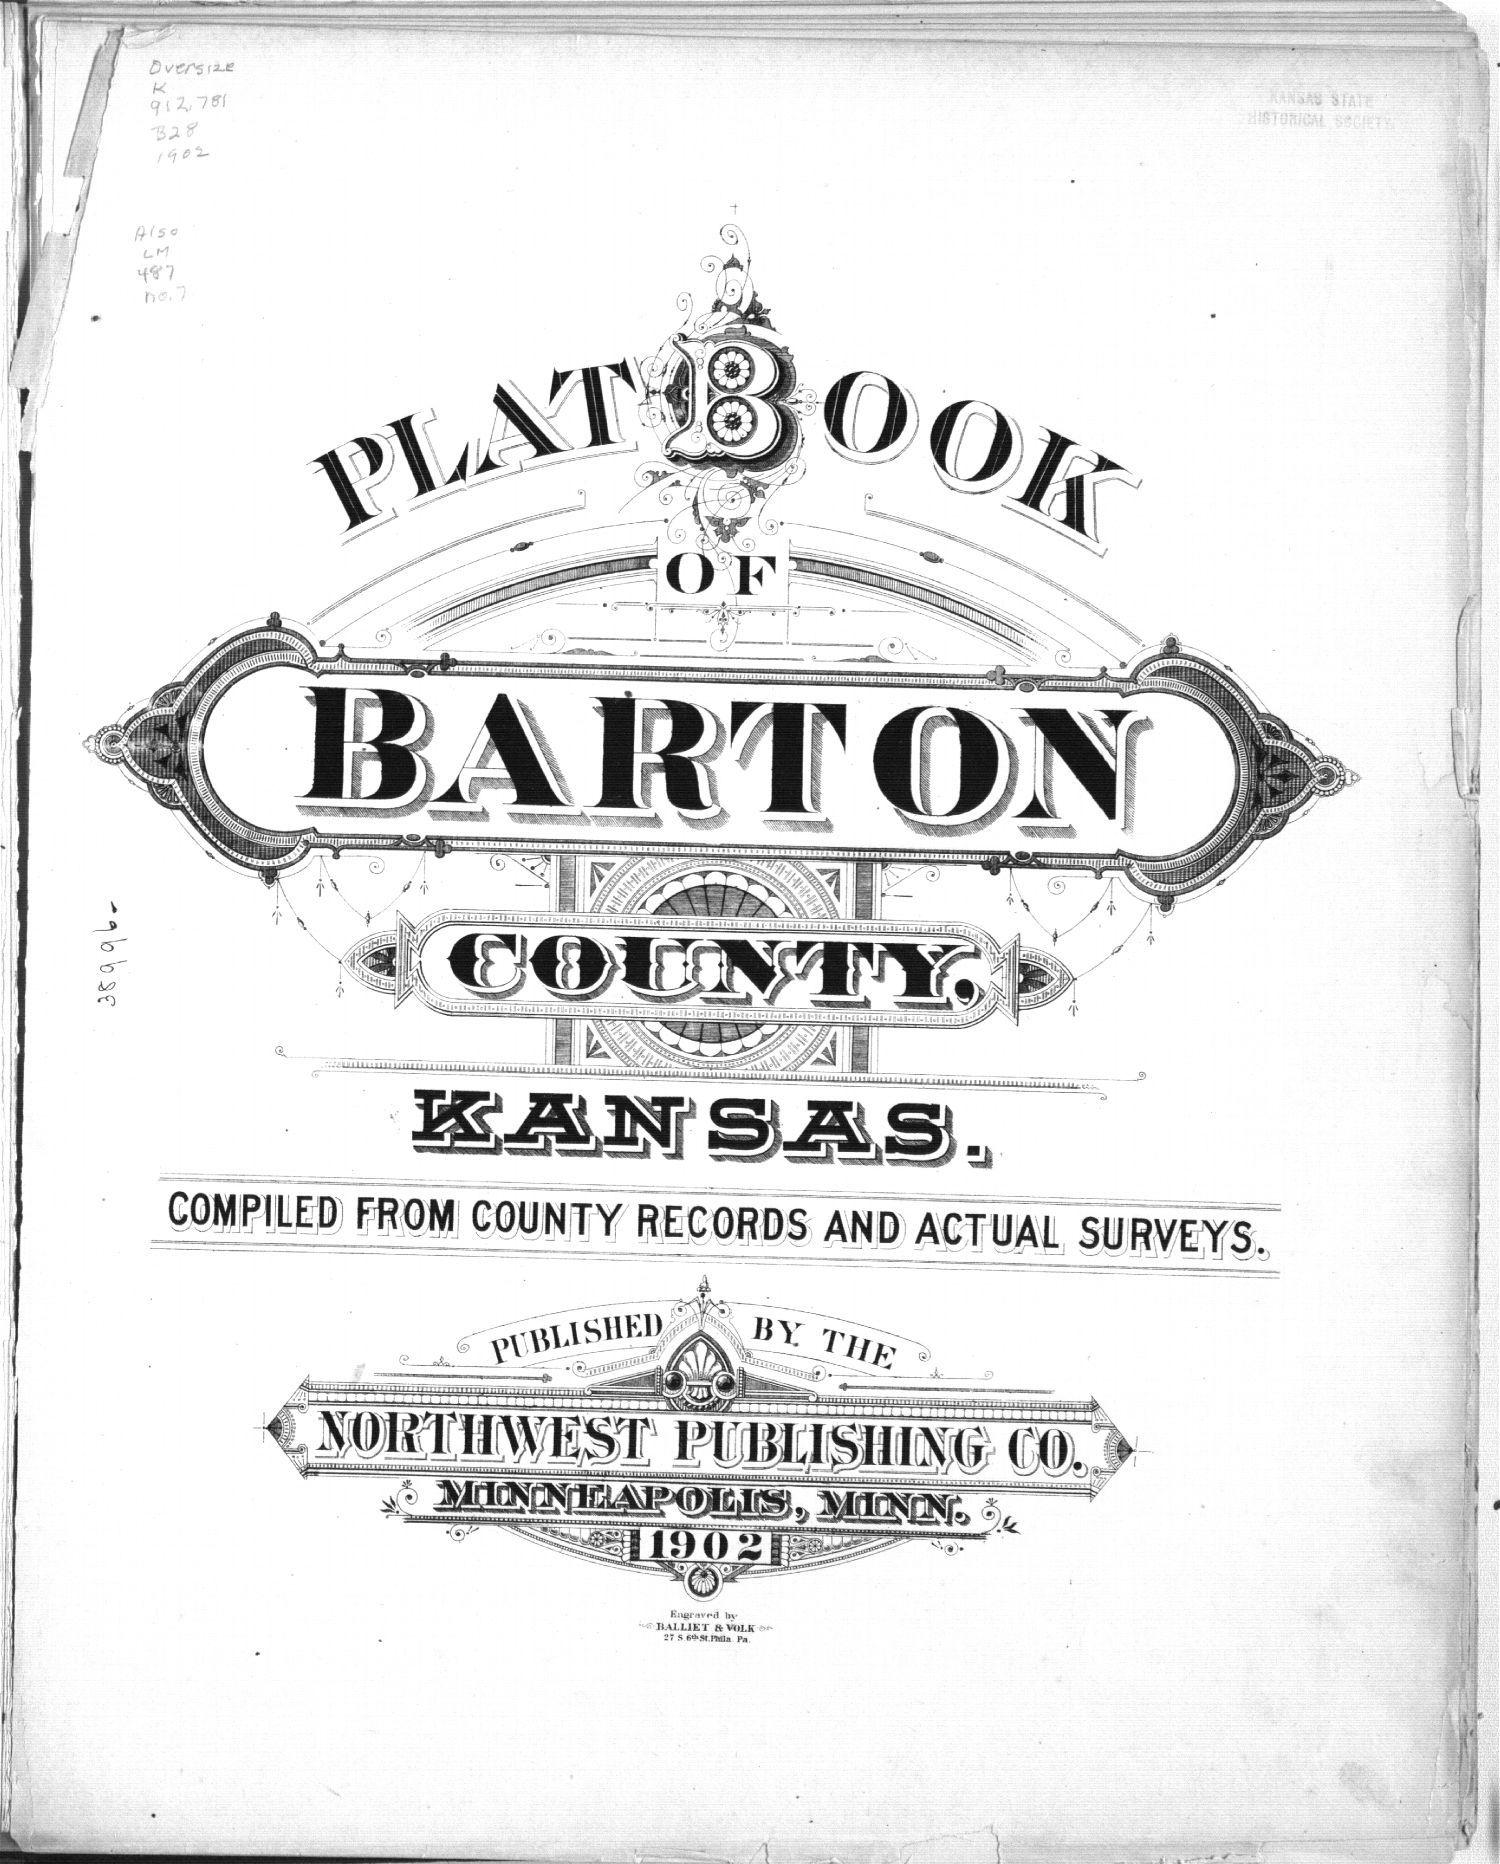 Plat book, Barton County, Kansas - Title Page